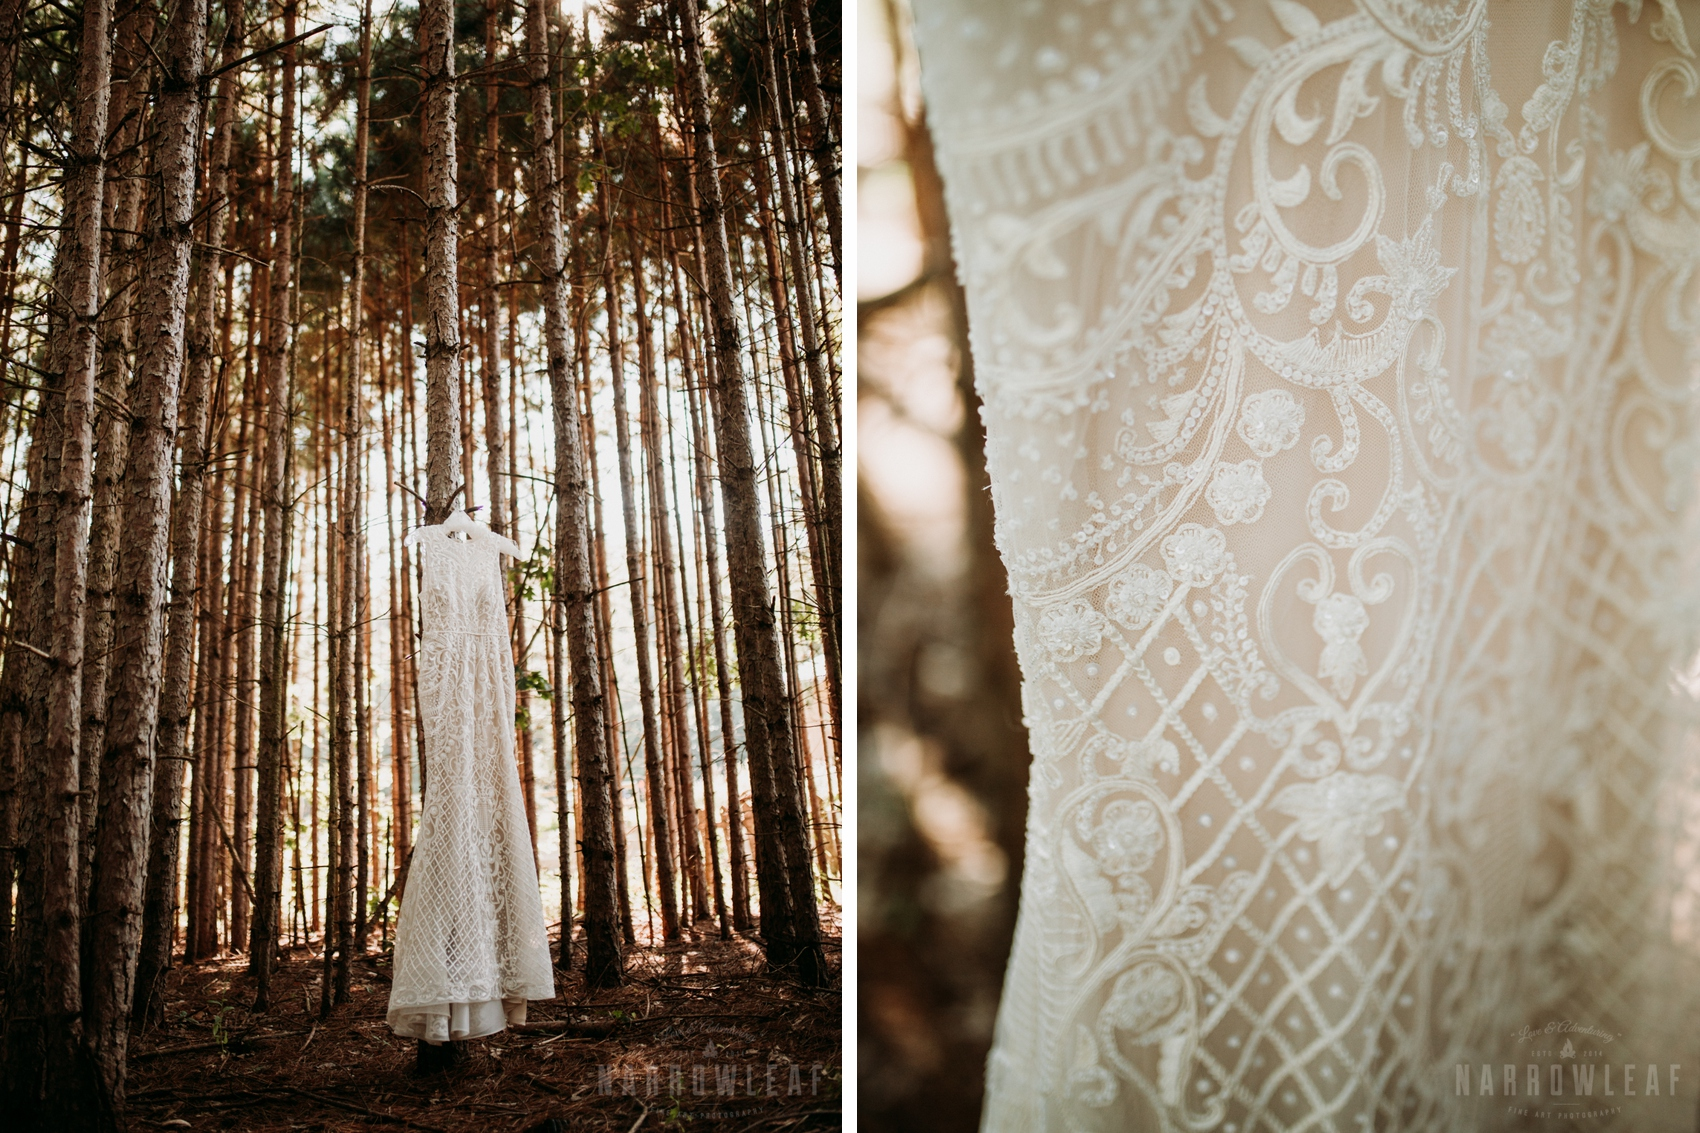 wooded-wedding-burlap-bells-wisconsin-001-002.jpg